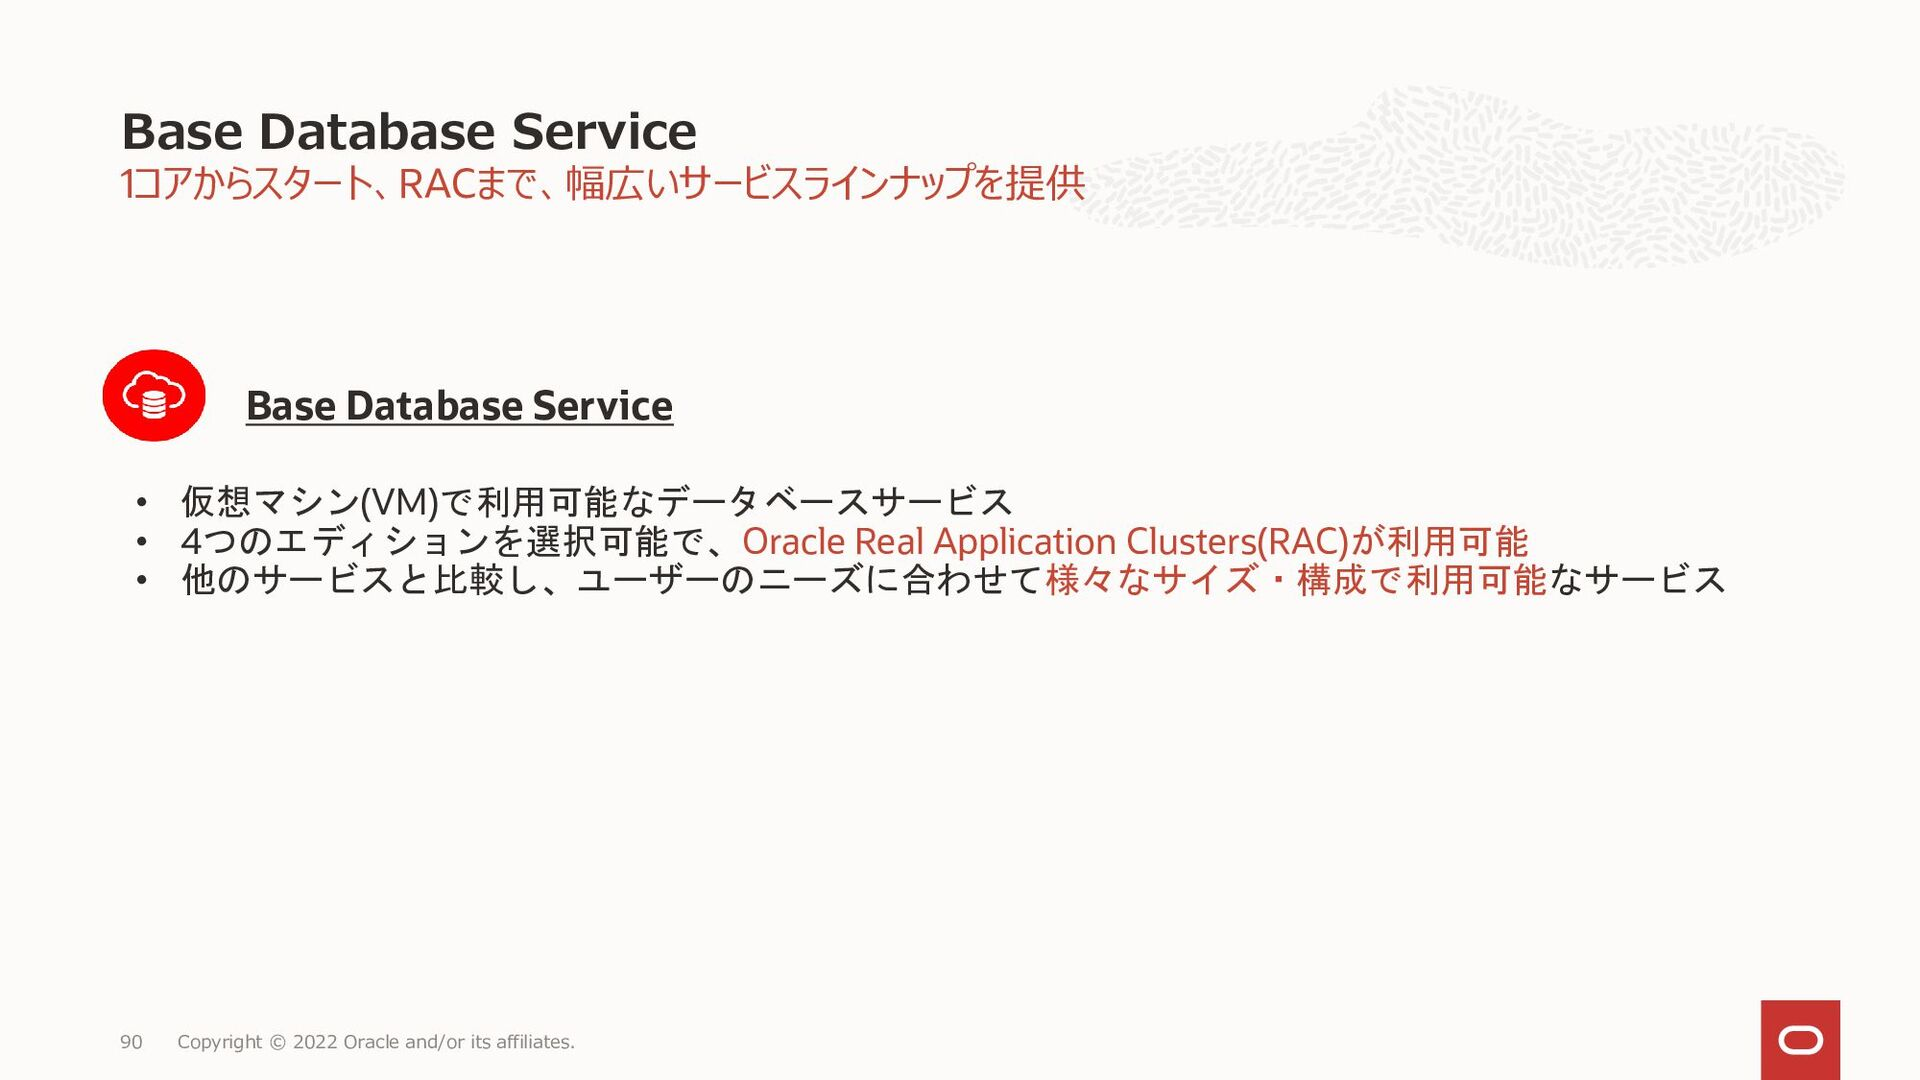 5 4 3 2 1 Appendix まとめ 技術詳細 サービス概要 サービス・ラインナップ ...